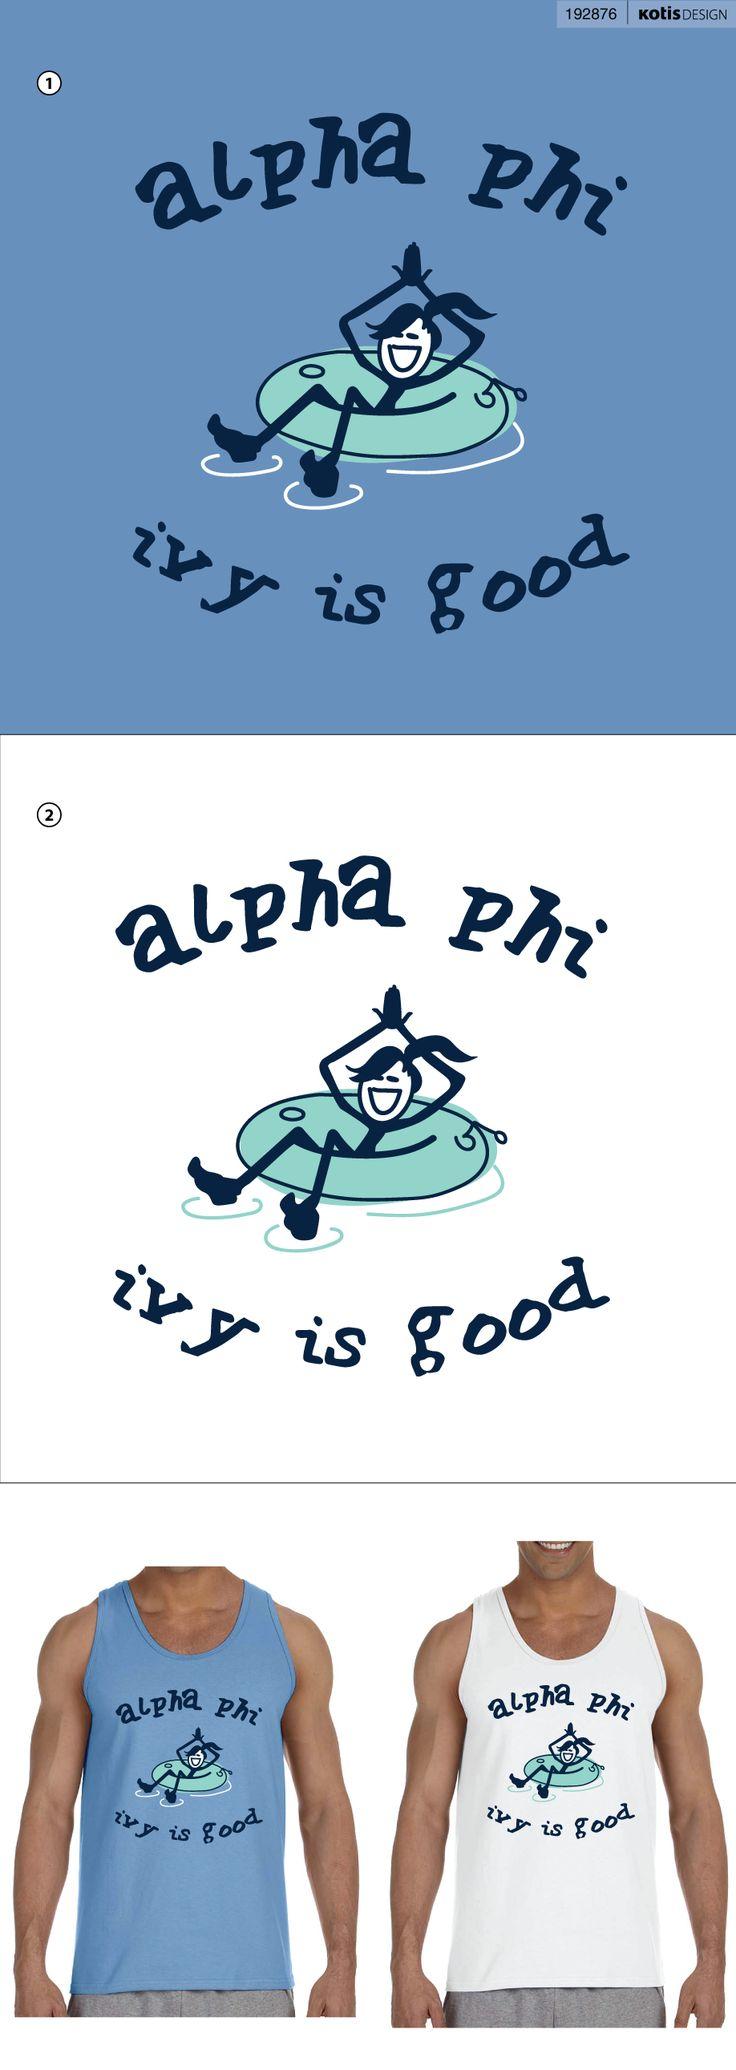 Alpha Phi - Sorority Clothing - Tank Top